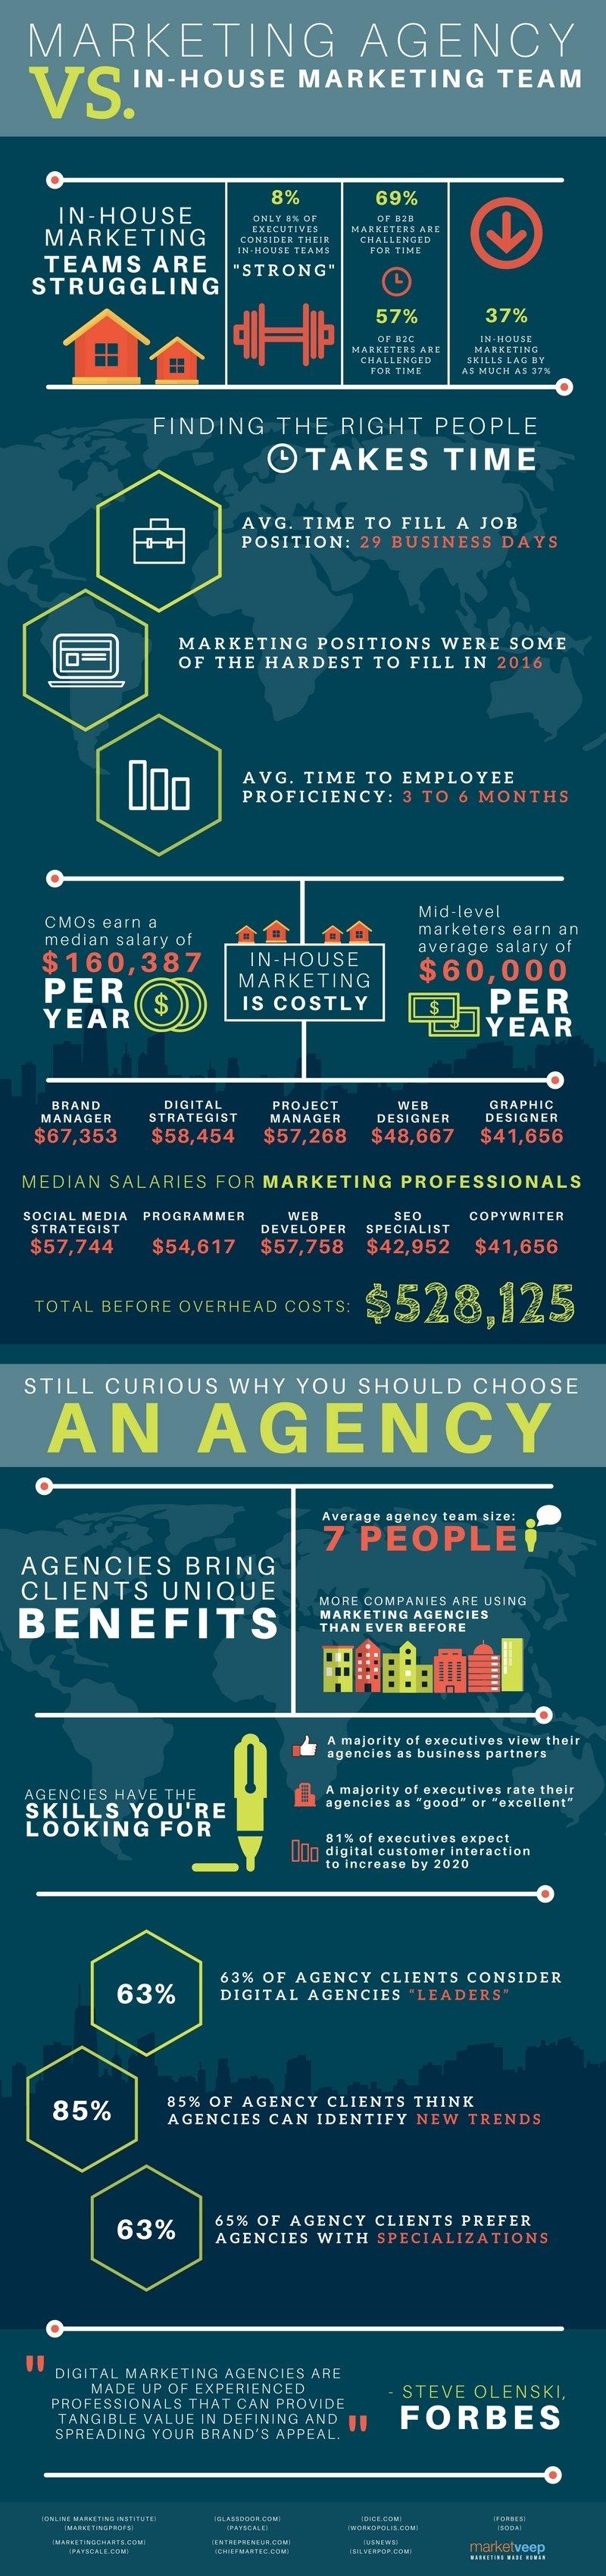 marketing agency vs. in-house team